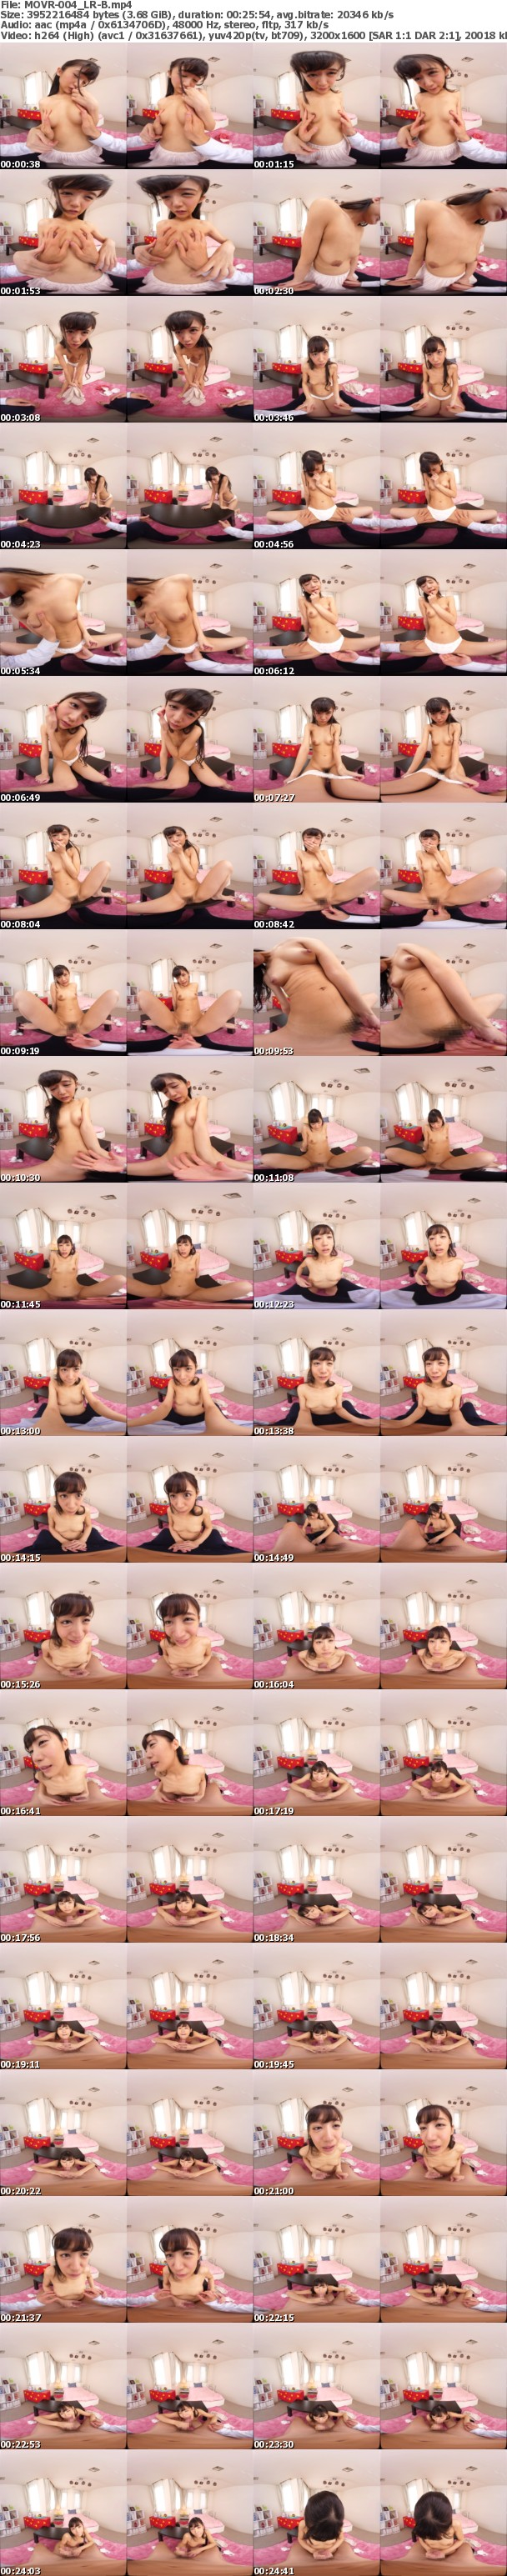 VR/3D MOVR-004【匠】つきあって1ヶ月の甘えん坊な彼女の部屋で遂にイチャラブ初エッチ